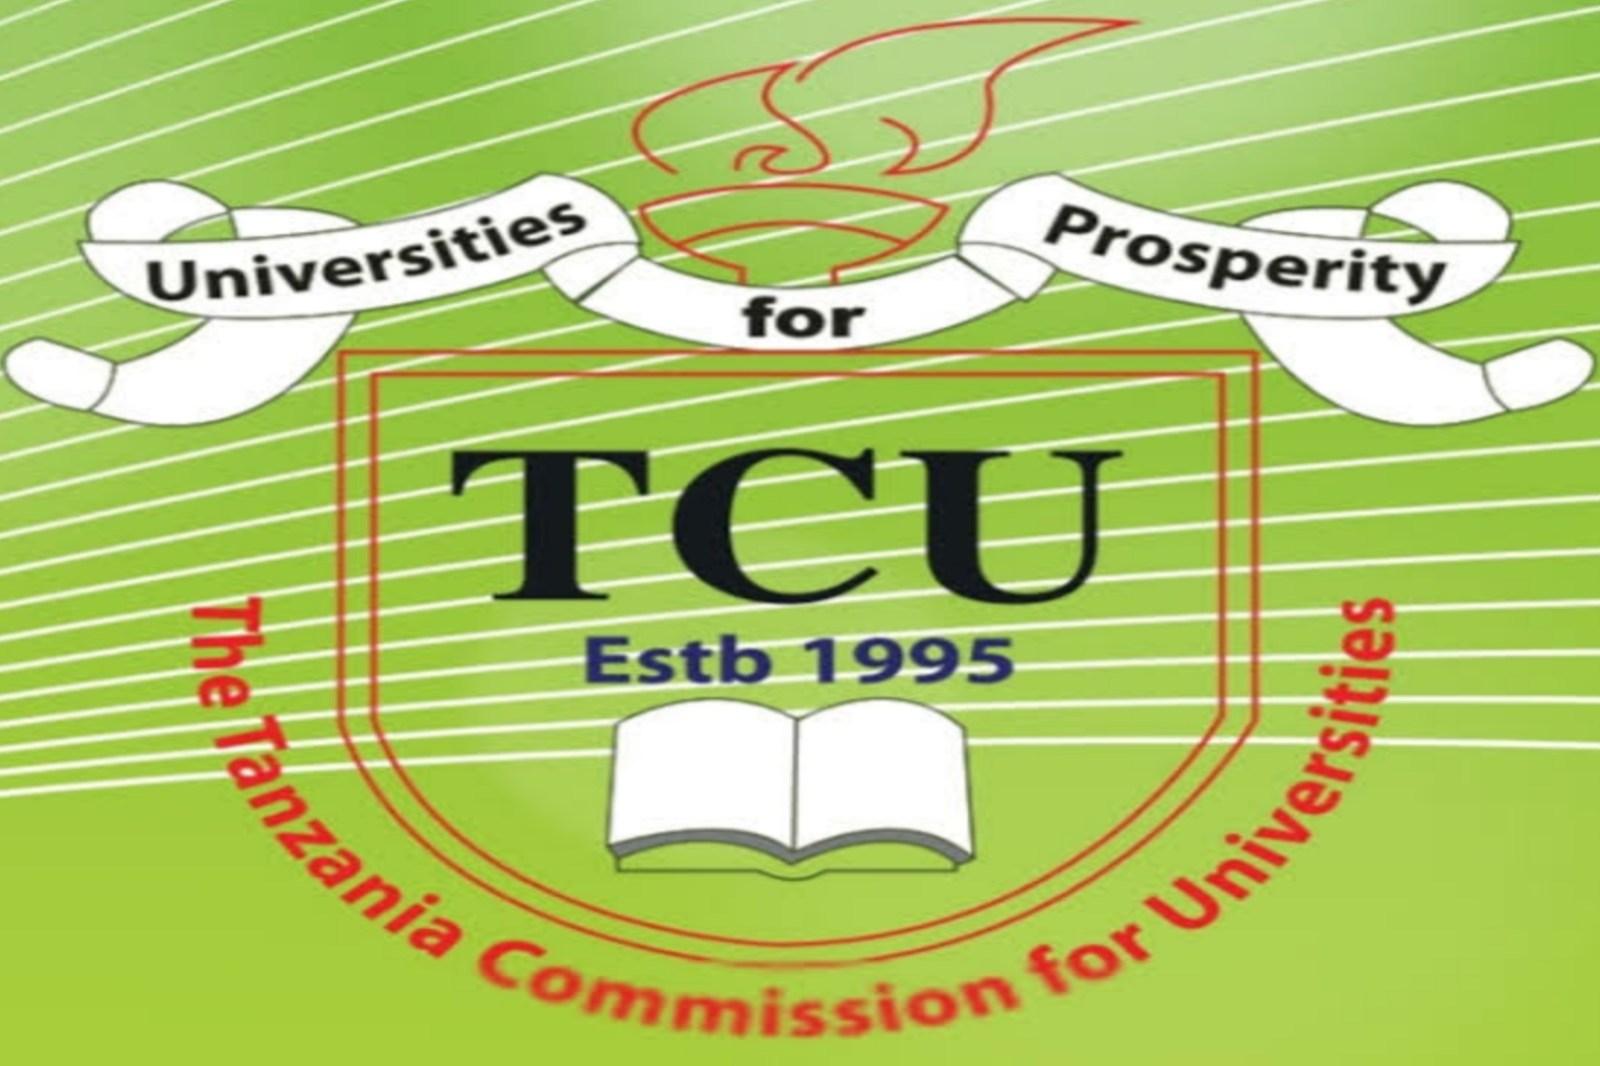 TCU Guide Book Diploma 2020/2021